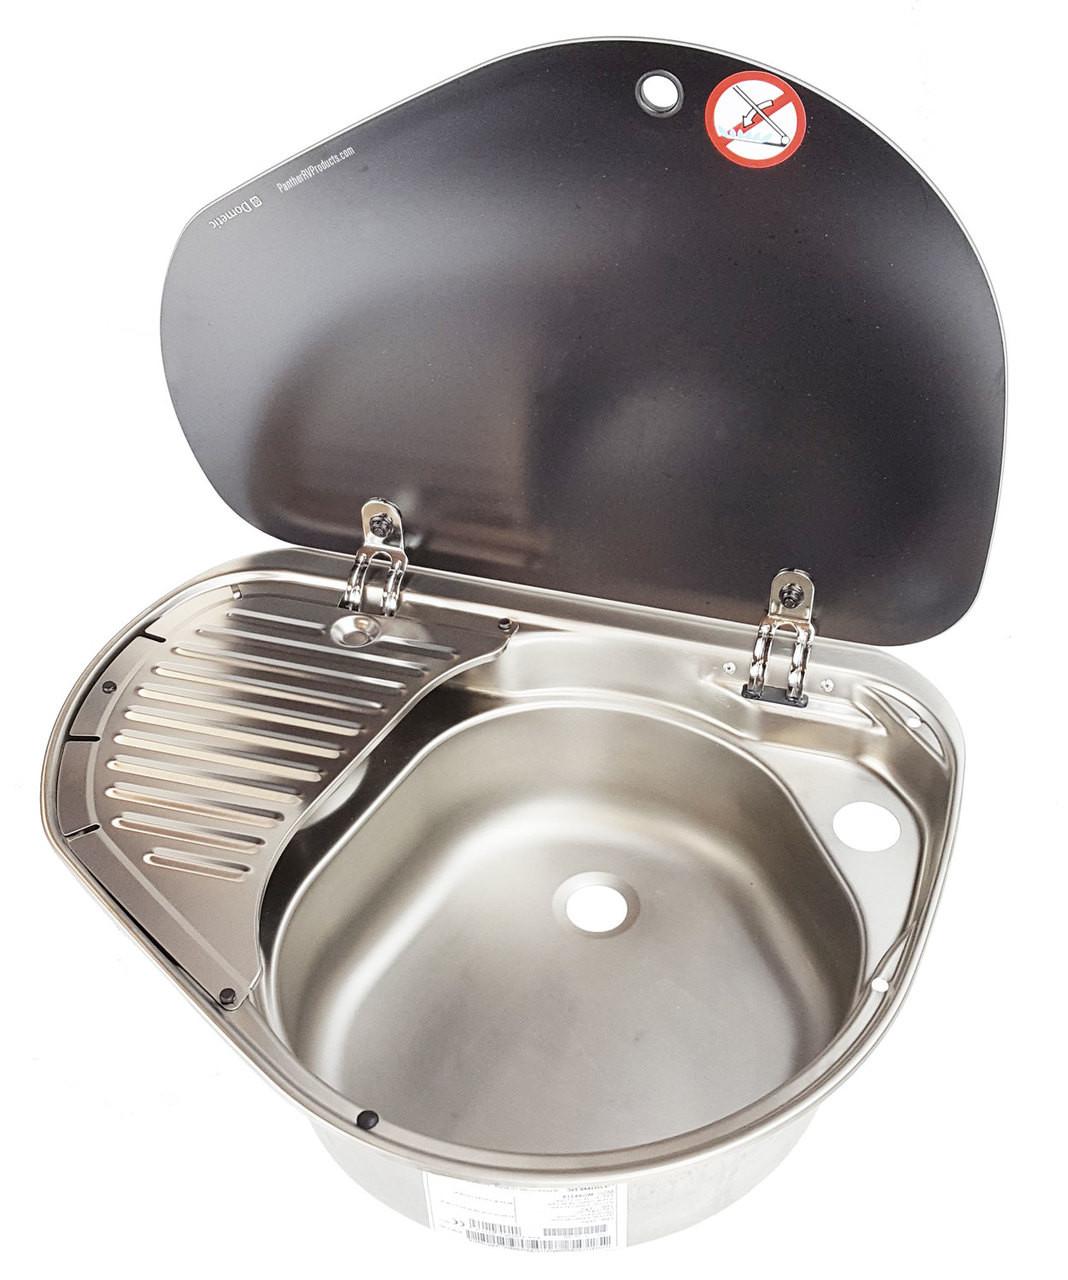 Smev Mo8821rus 1 Burner Rv Marine Propane Cooktop W Sink